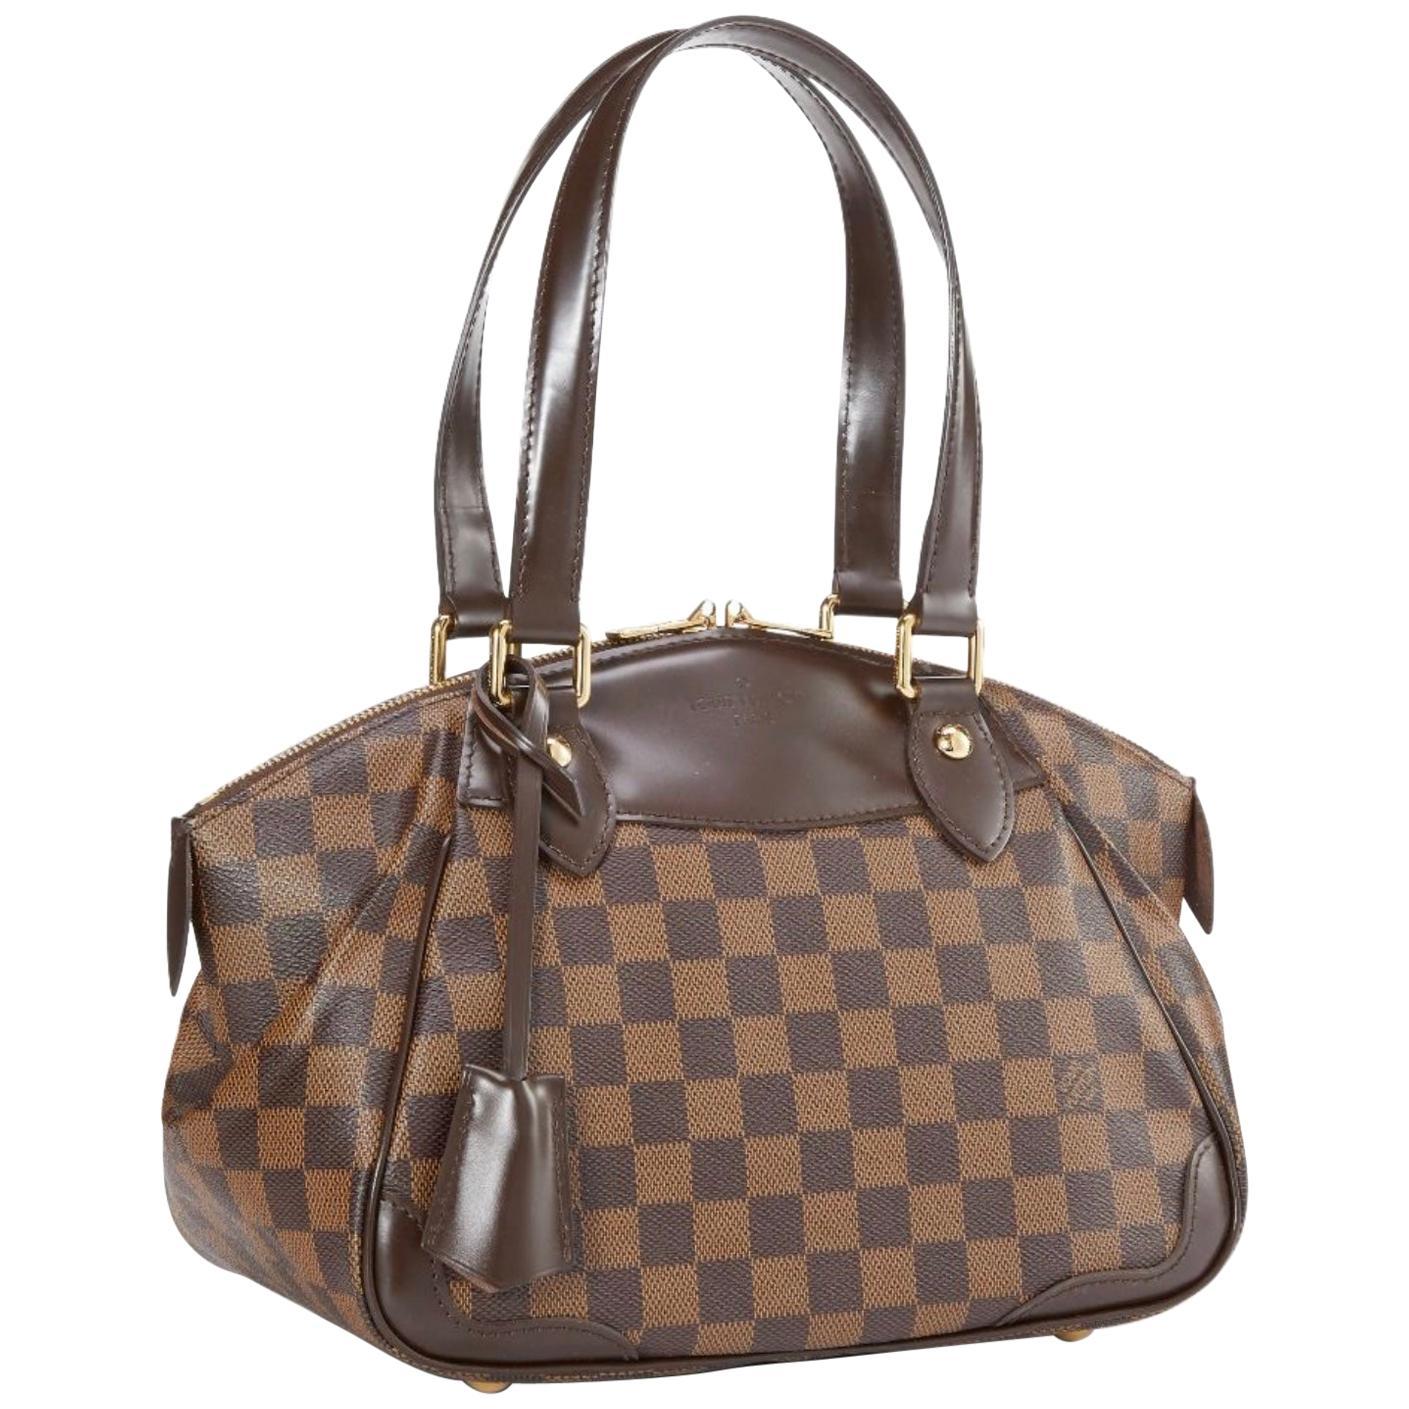 Louis Vuitton Brown Damier  Ebene Canvas Verona PM Handbag / Shoulder Bag New